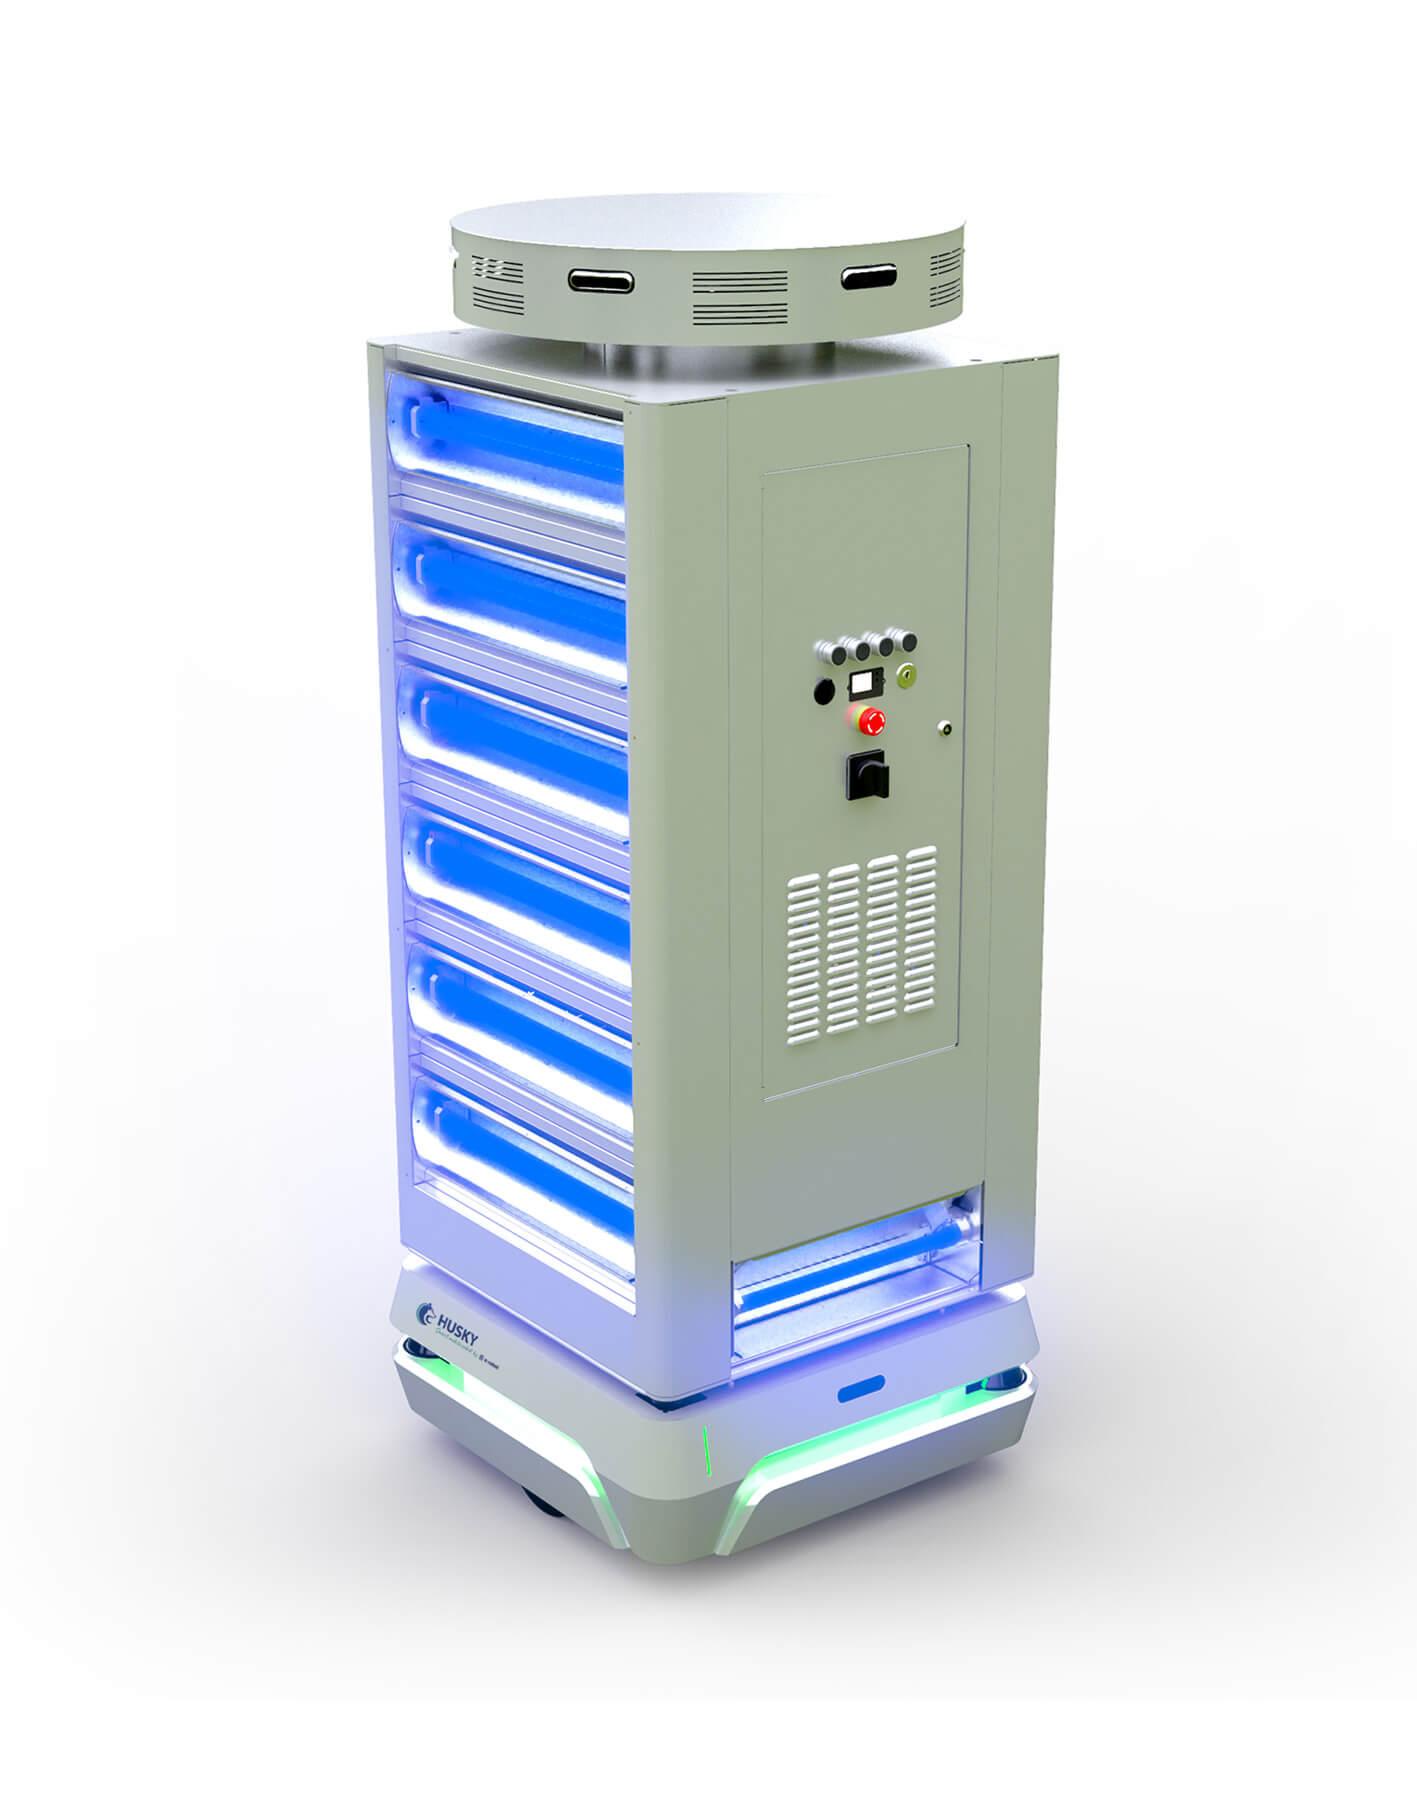 HUSKY-UV-robot-mobile-desinfection-uv-c-autonome